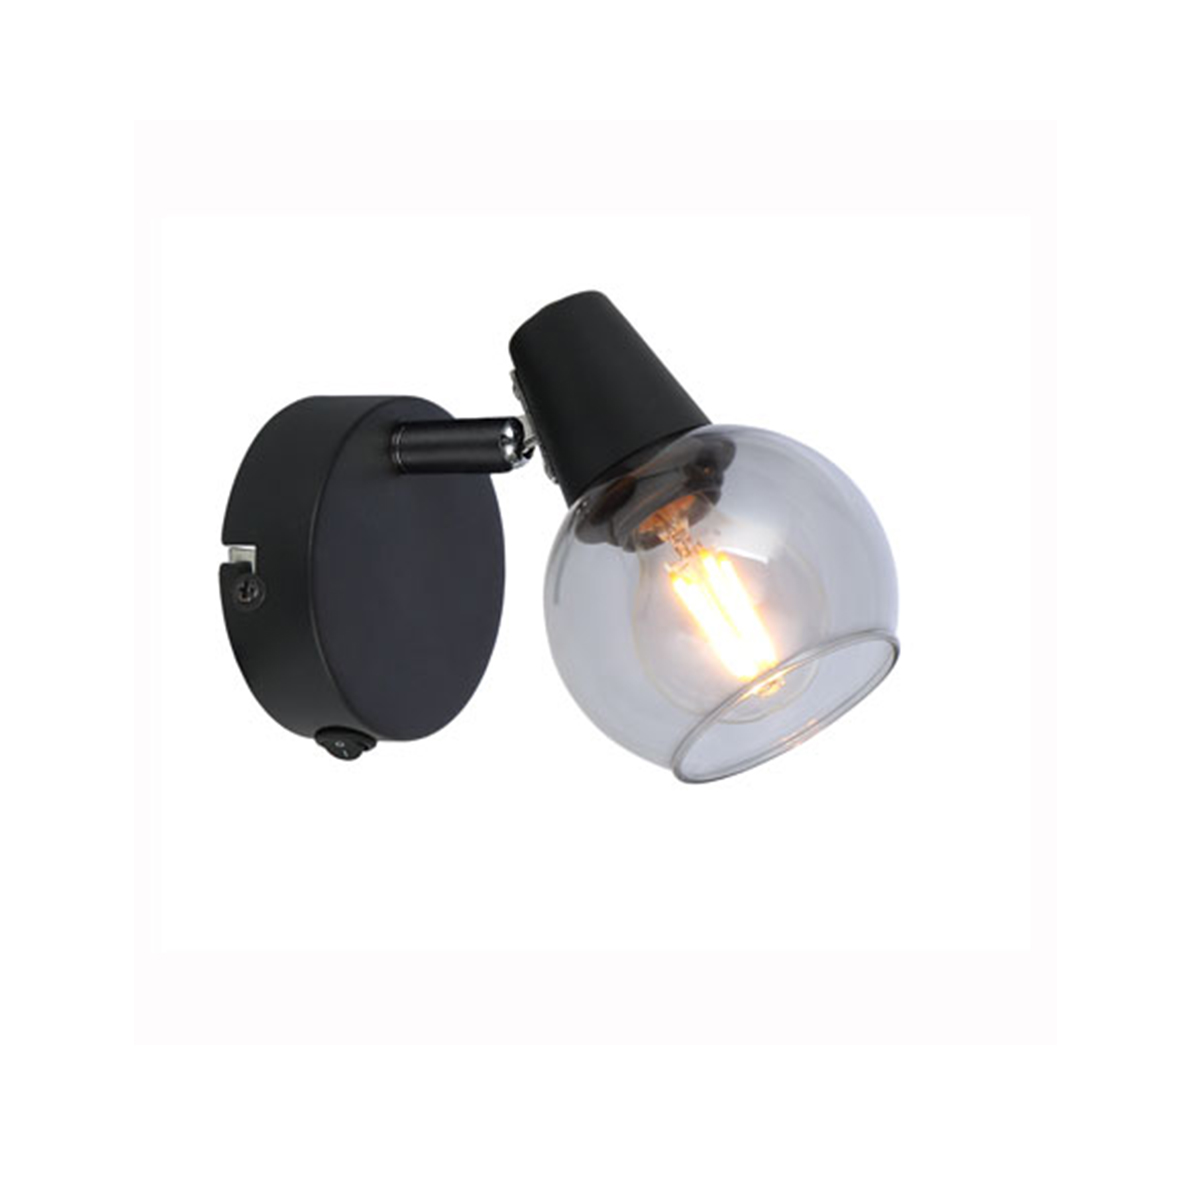 Spot lampa Dorothea/1 6601964